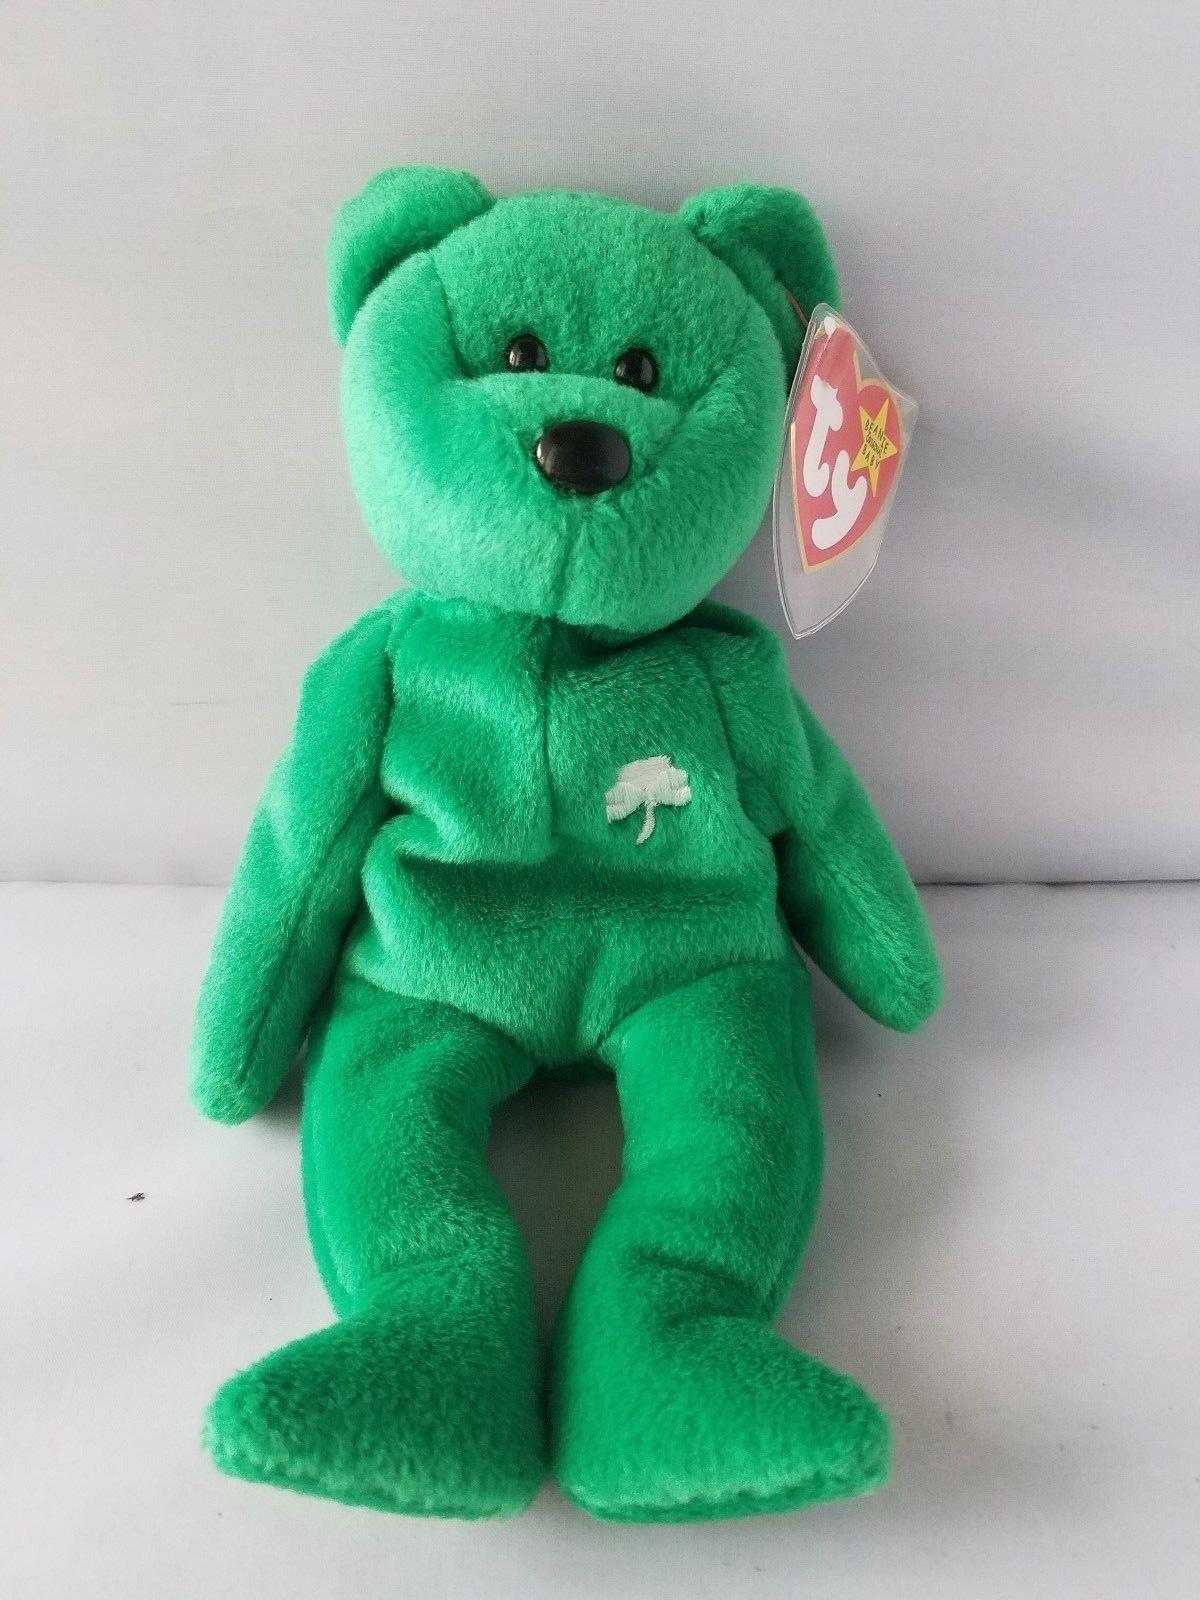 b0449006eb7 ... Ty Beanie Baby Erin St. Patrick s Day Green Irish Bear 5th Generation  ...